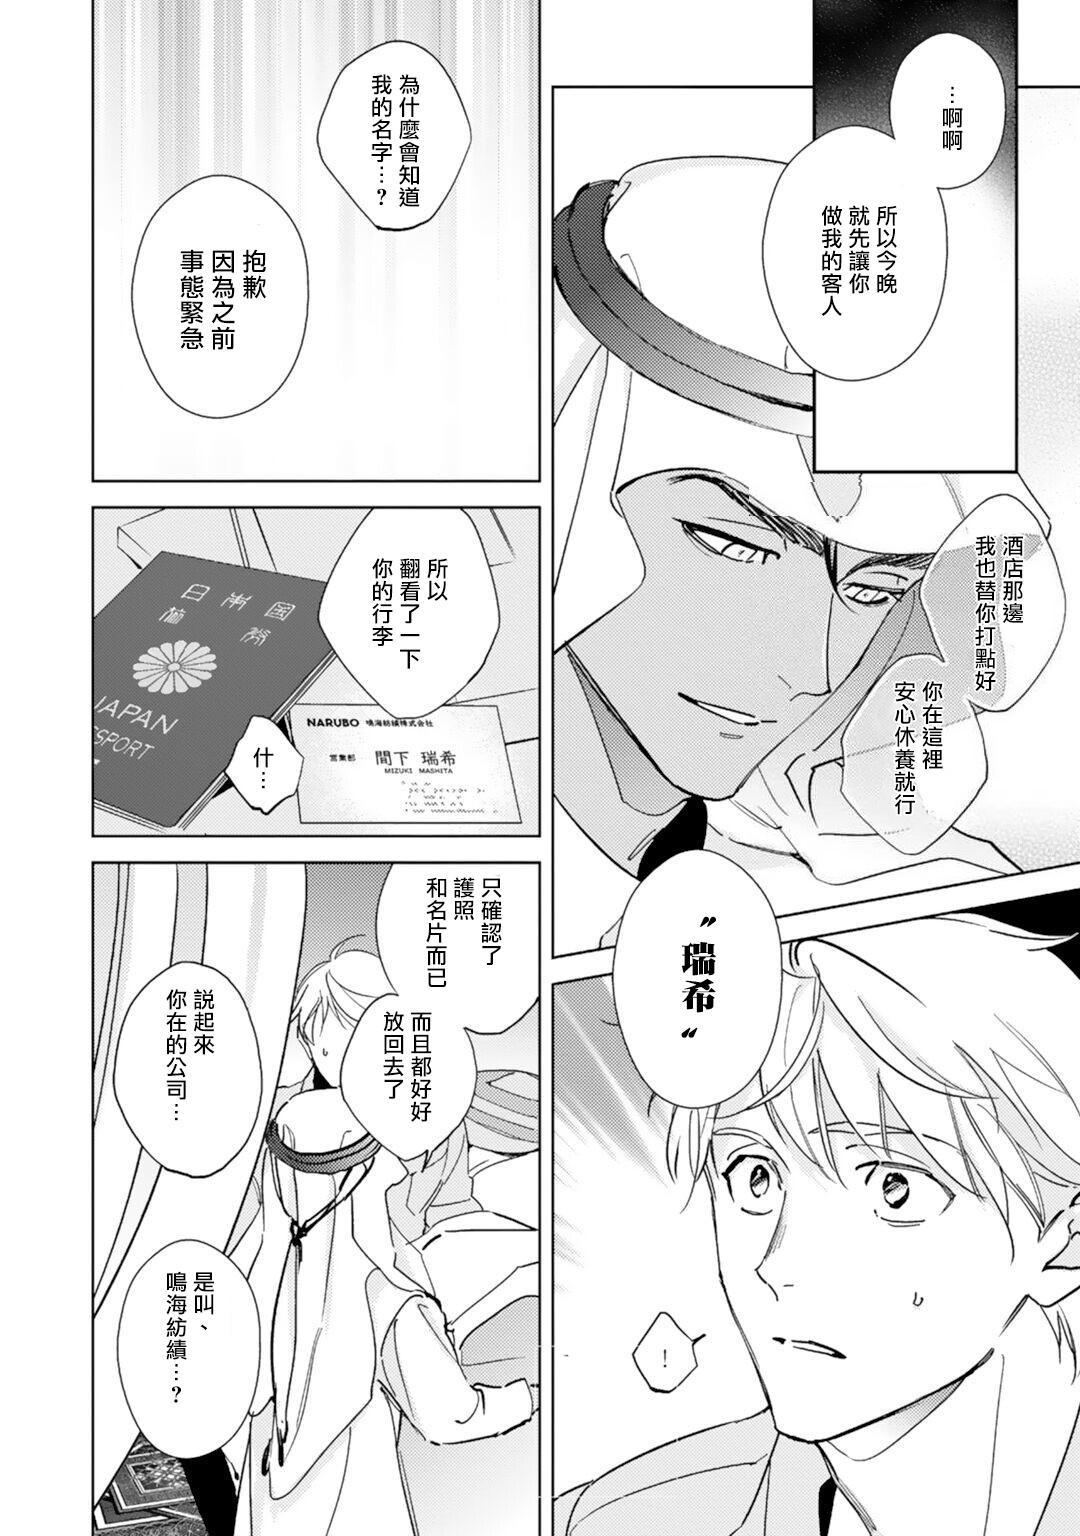 Amber Vanilla no Hanayome | 琥珀香草的新娘 Ch. 1-3 8